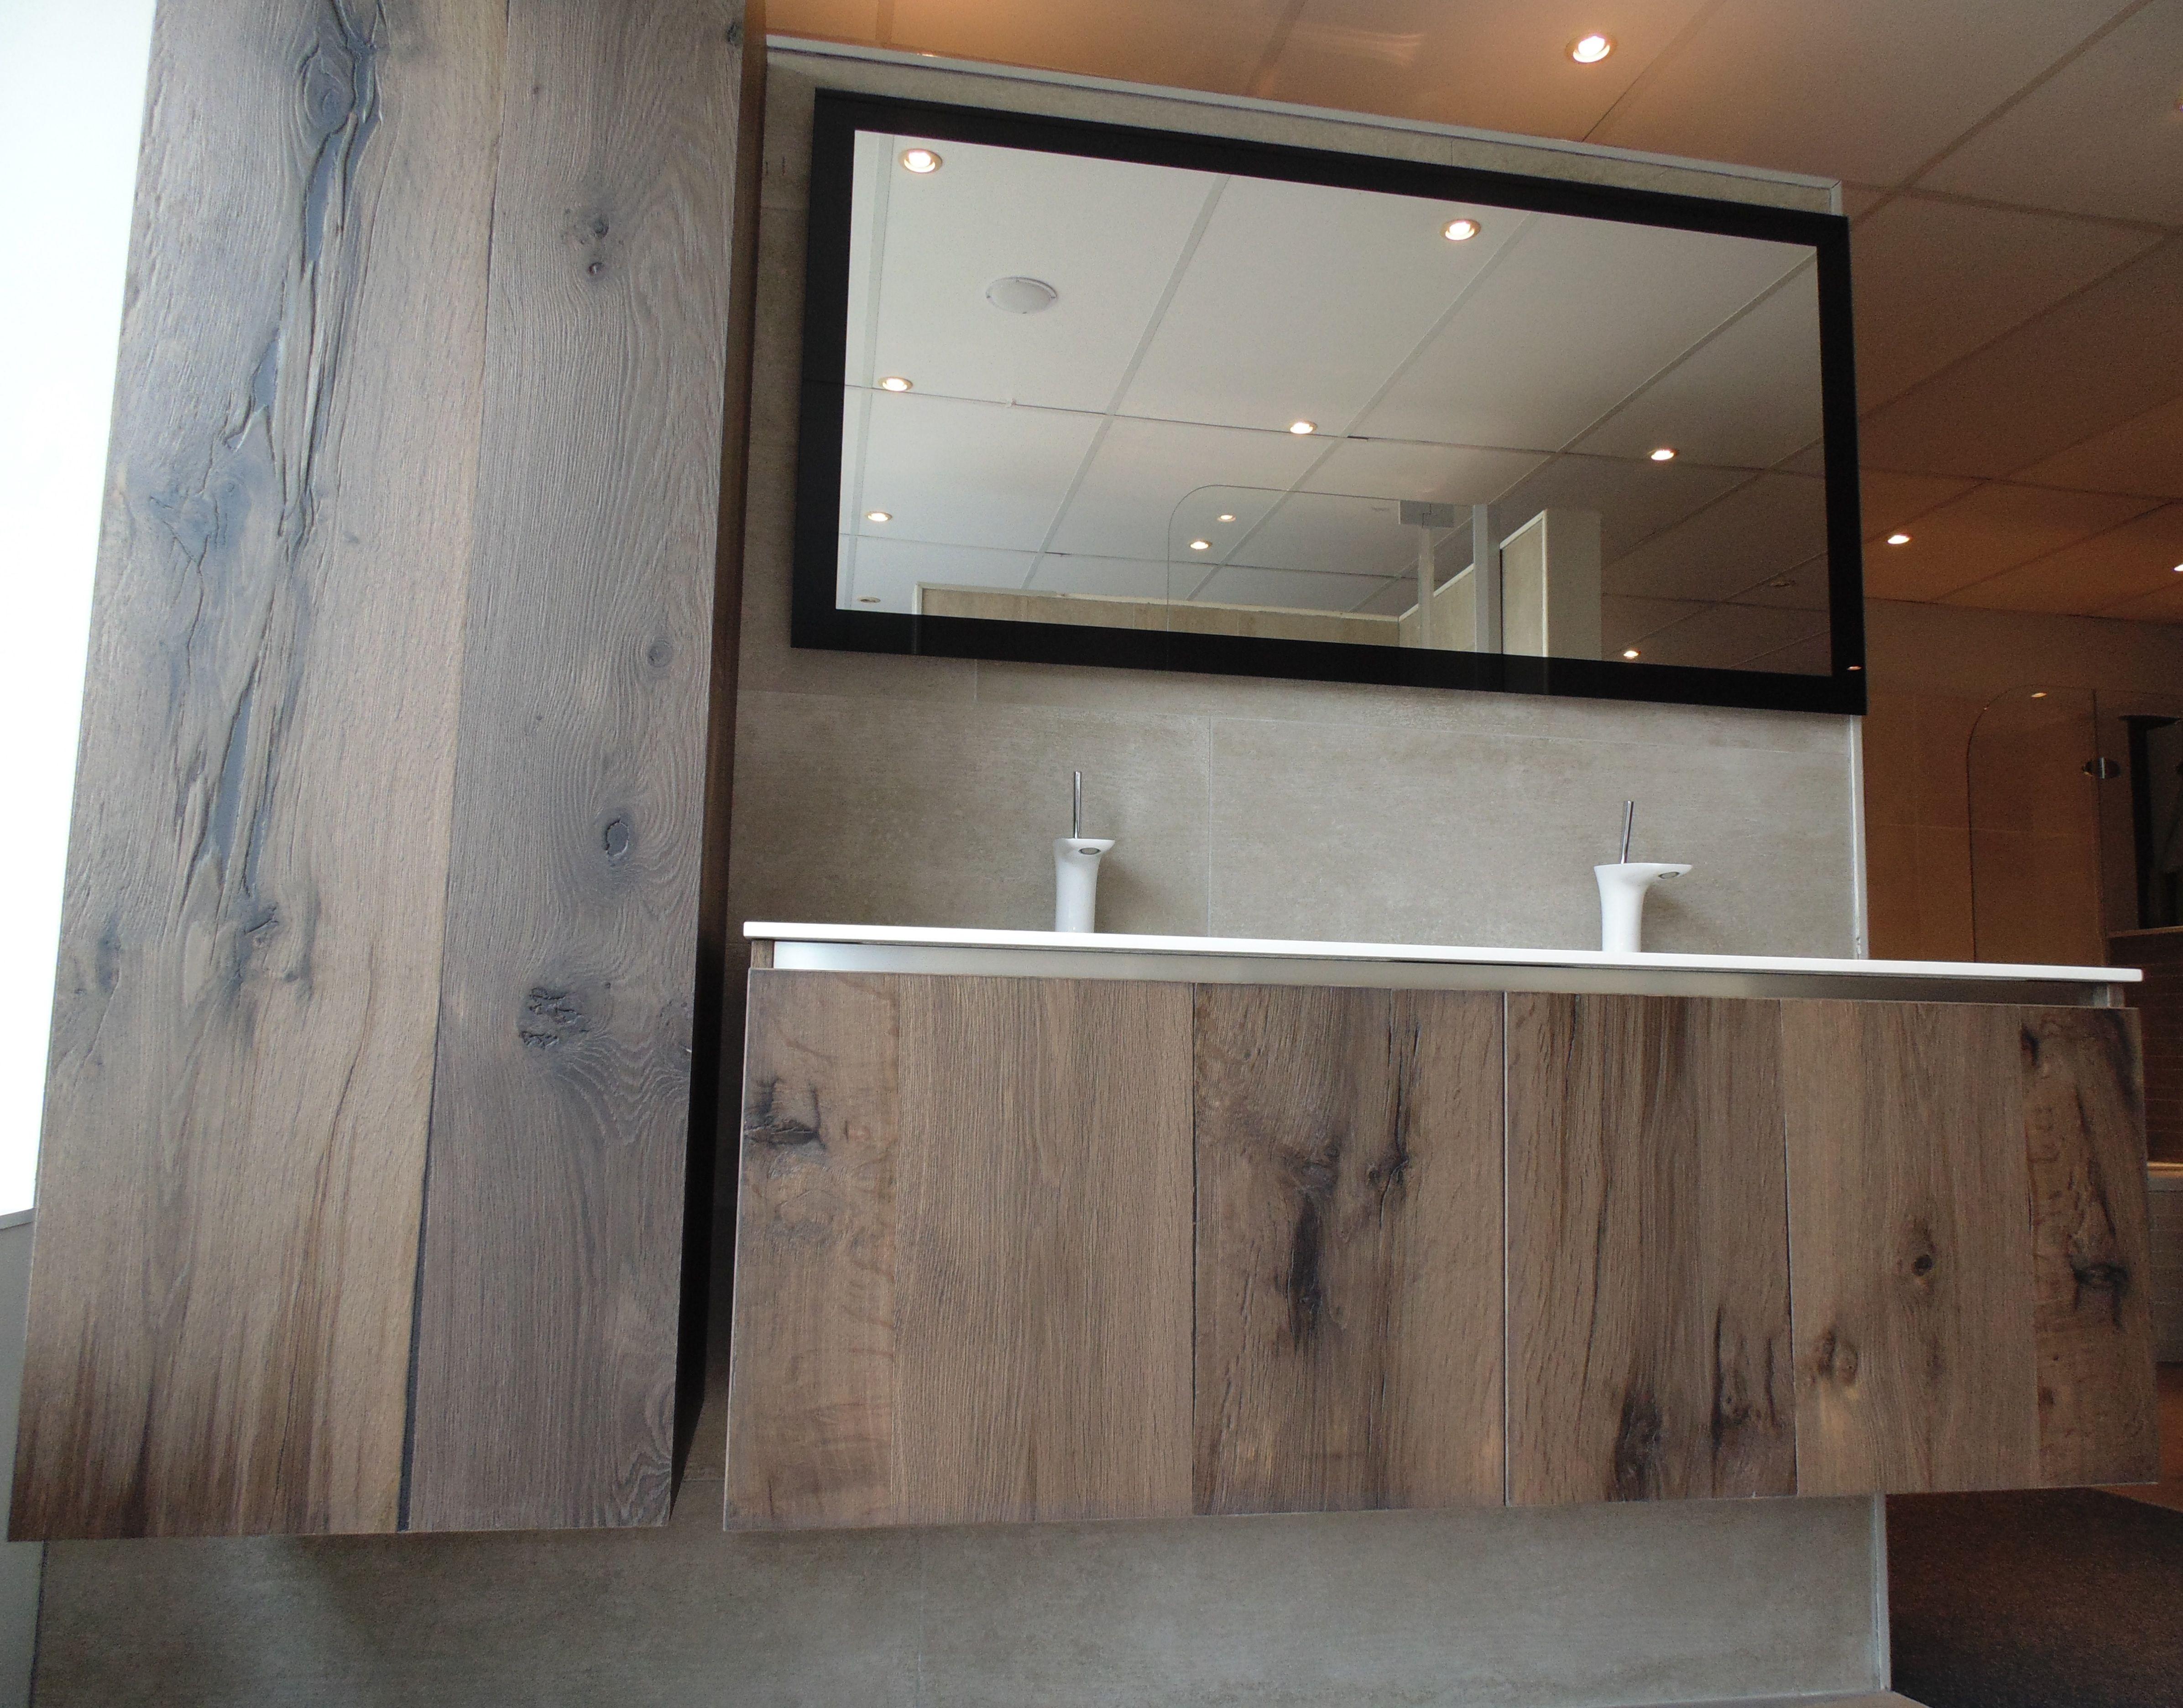 Houten Onderkast Badkamer : Badkamer meubel met houten onderkasten en een kolomkast badkamer